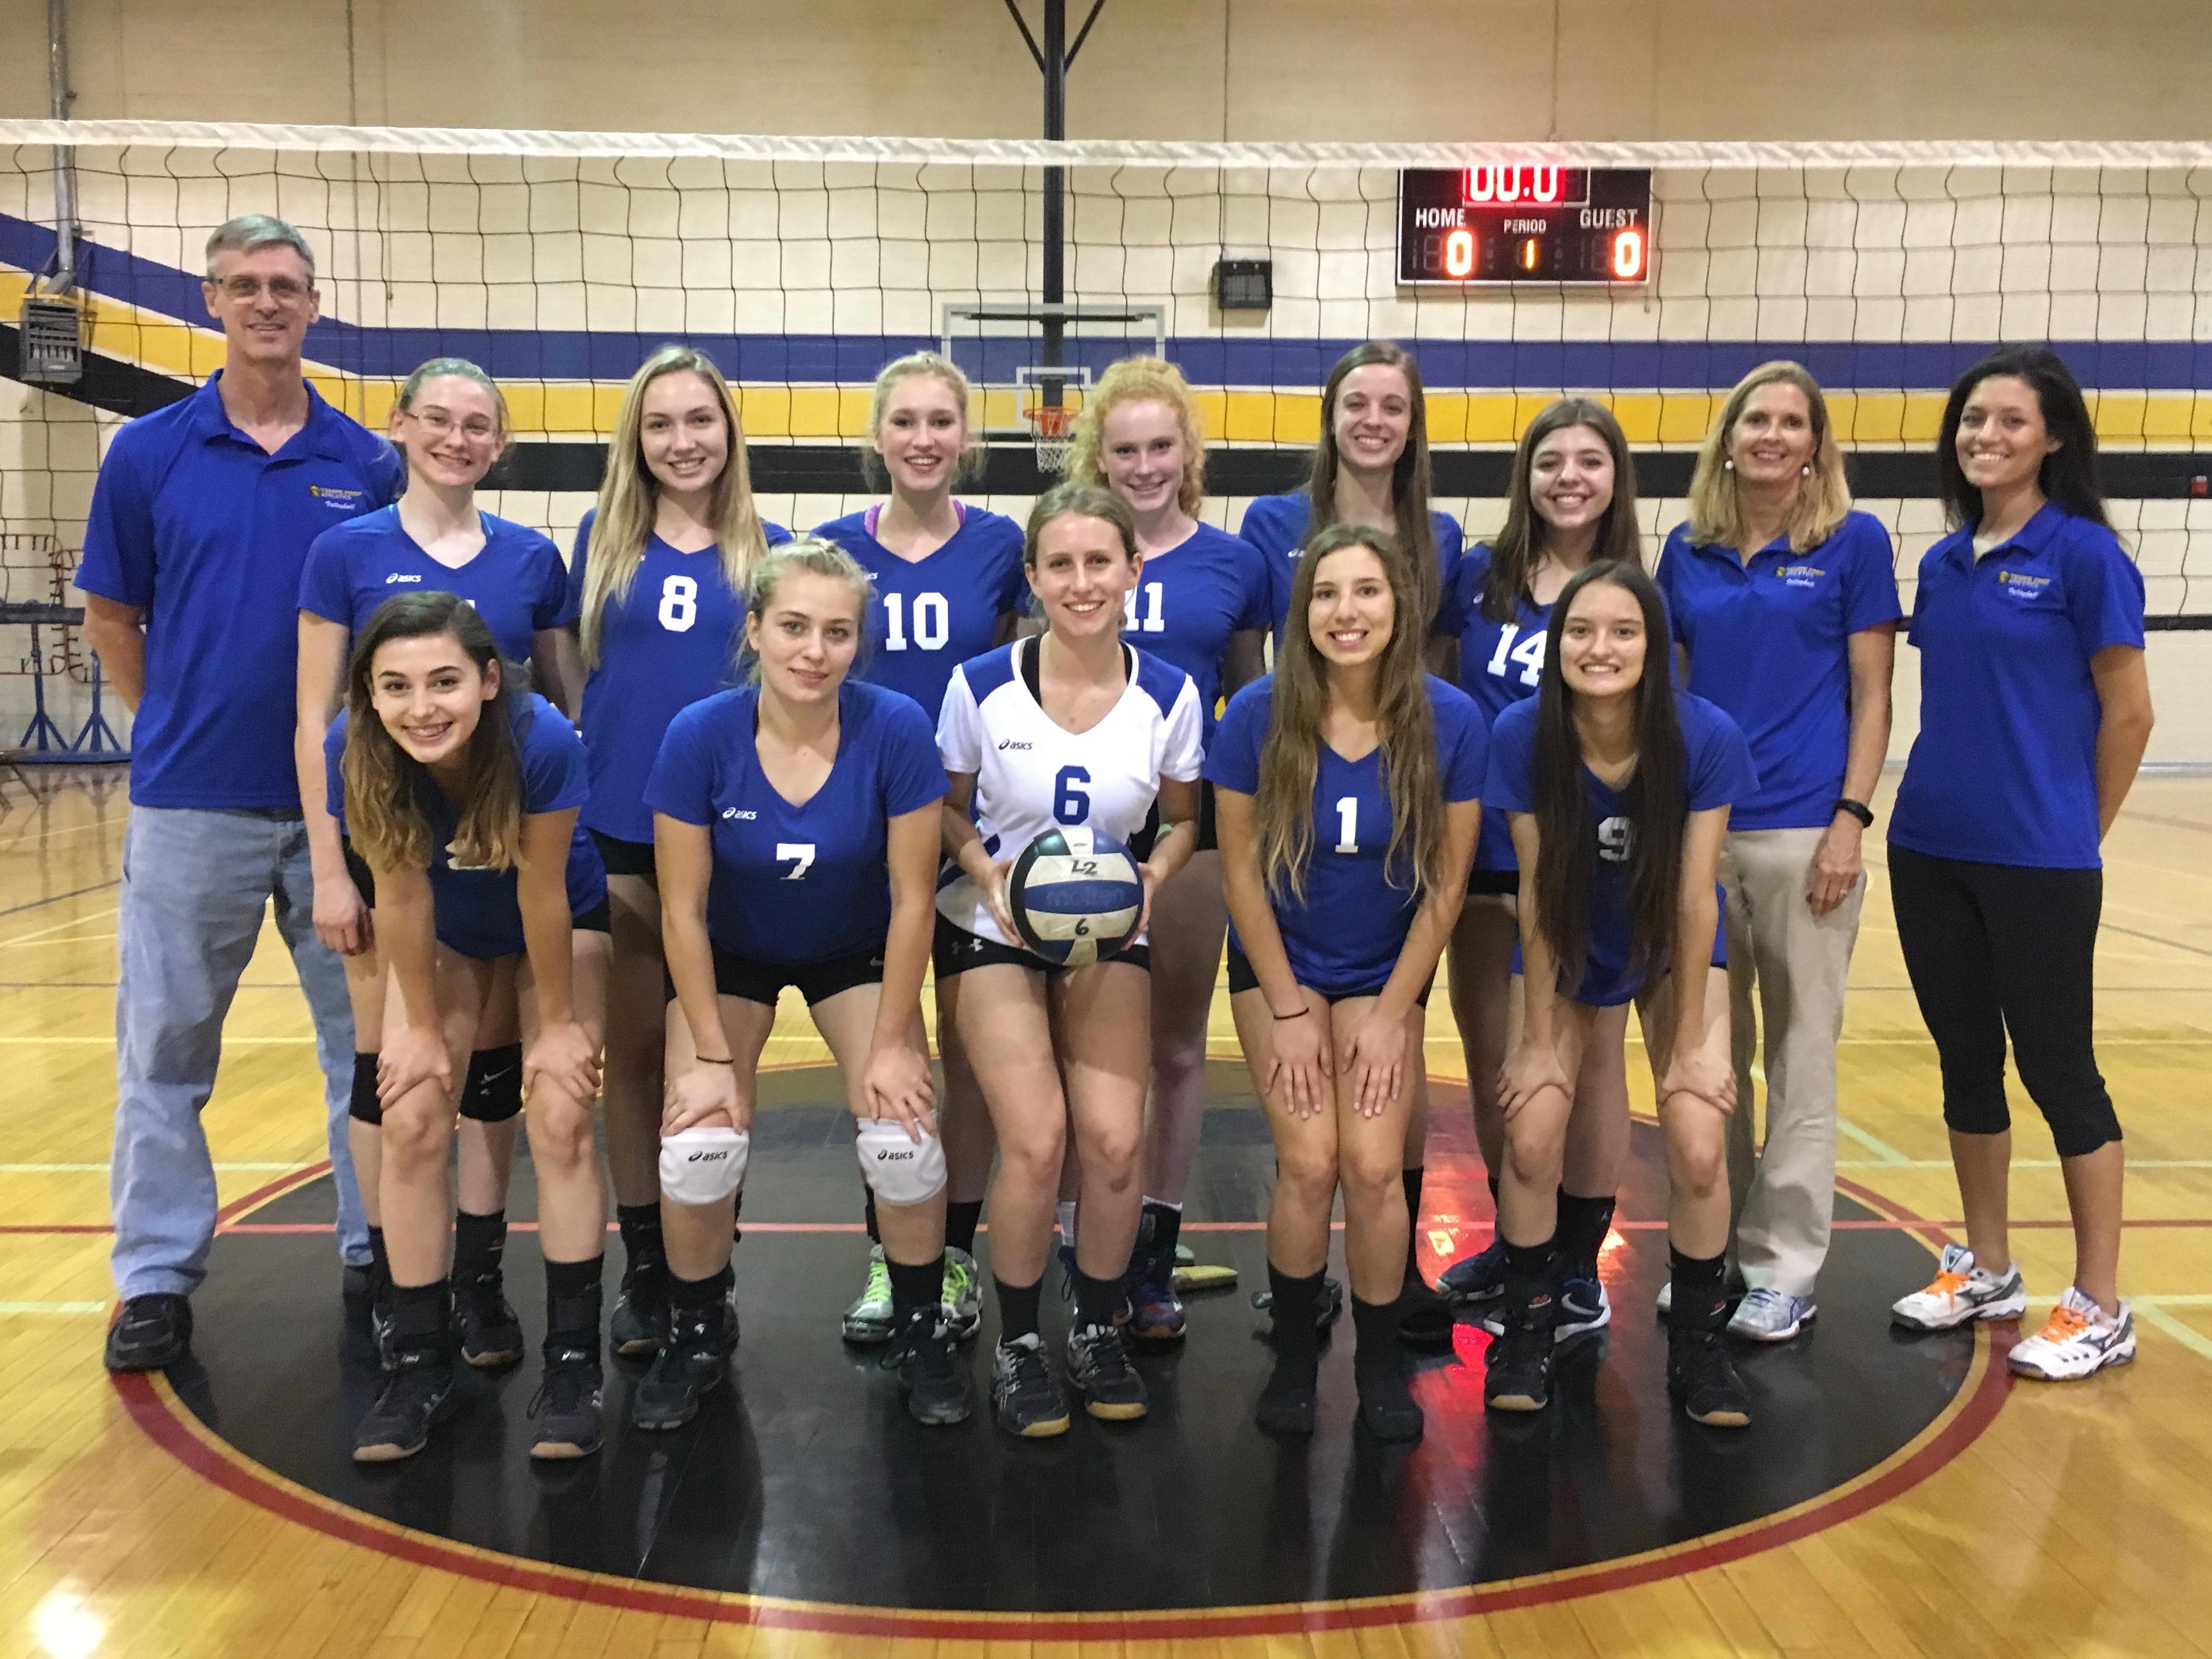 Girls Volleyball - Girls Volleyball - Santa Ynez Valley